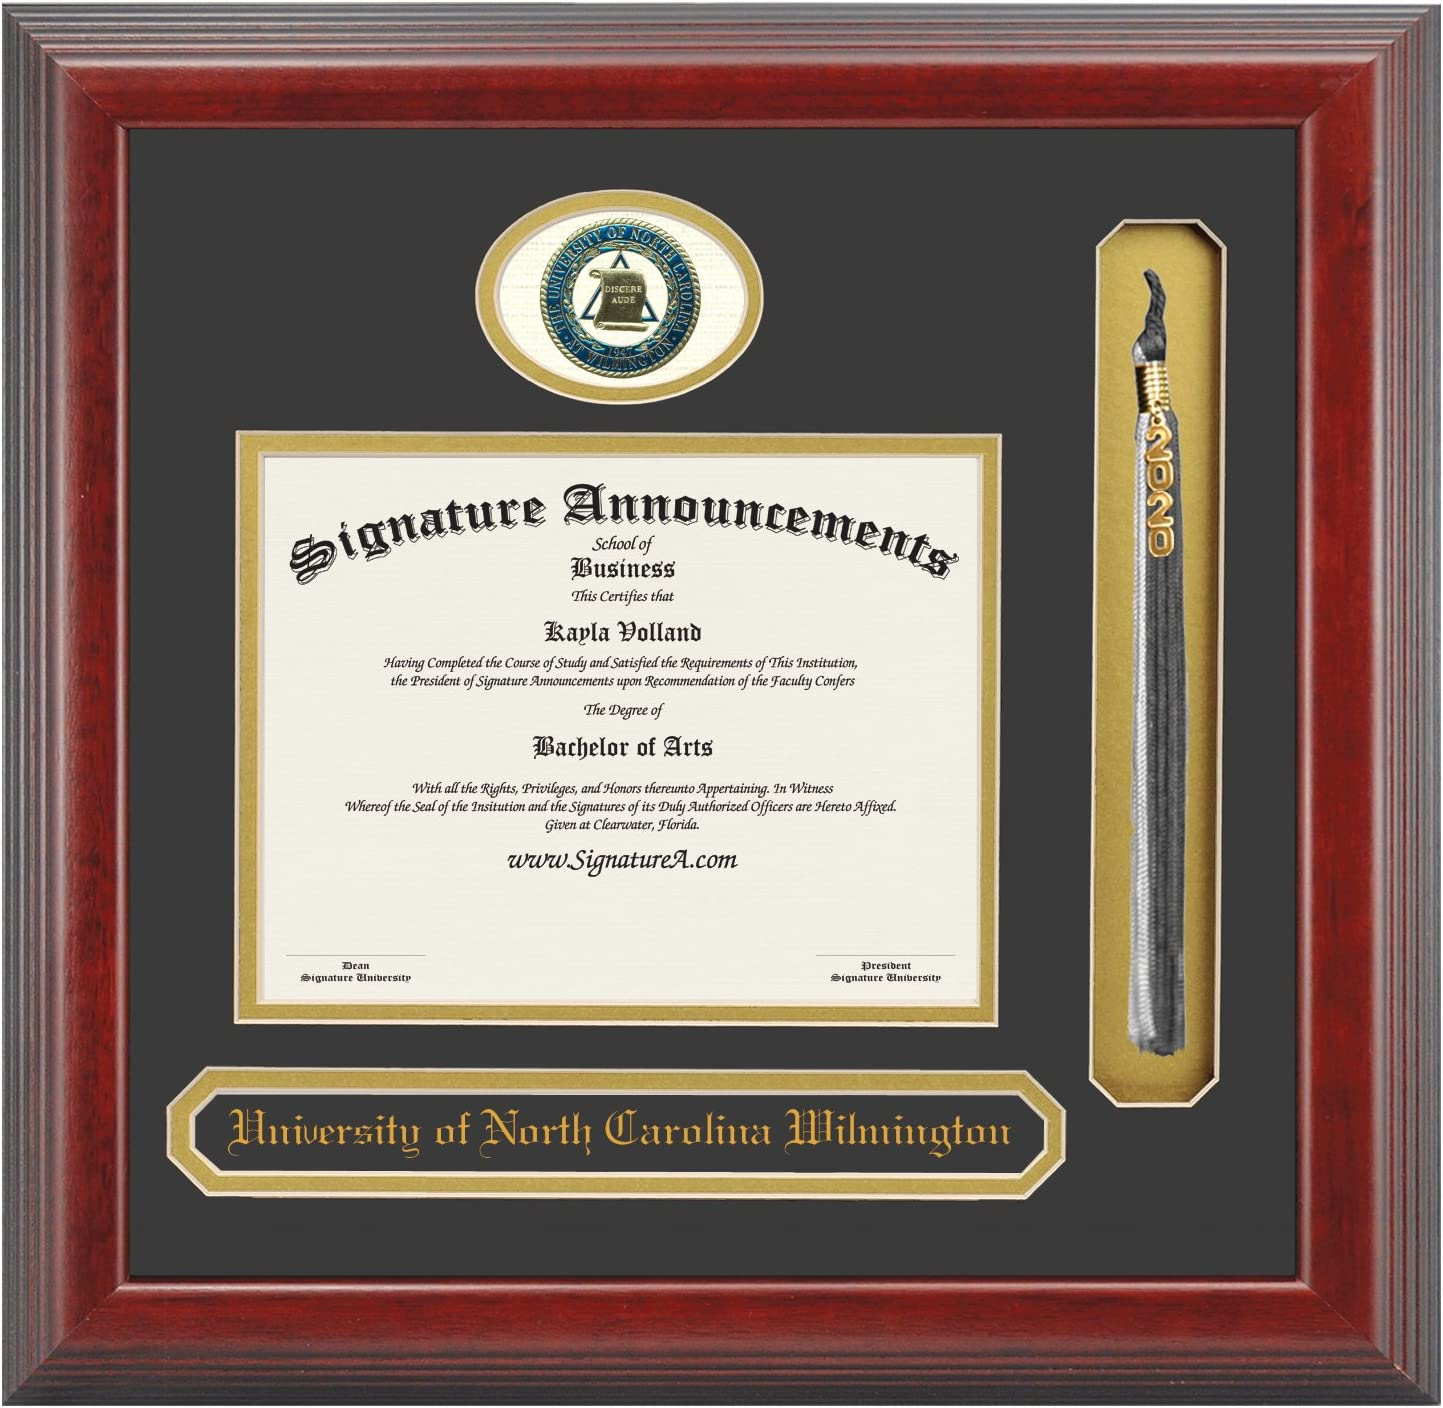 Signature Nashville-Davidson outlet Mall Announcements DF-26001-120532 University of Caro North